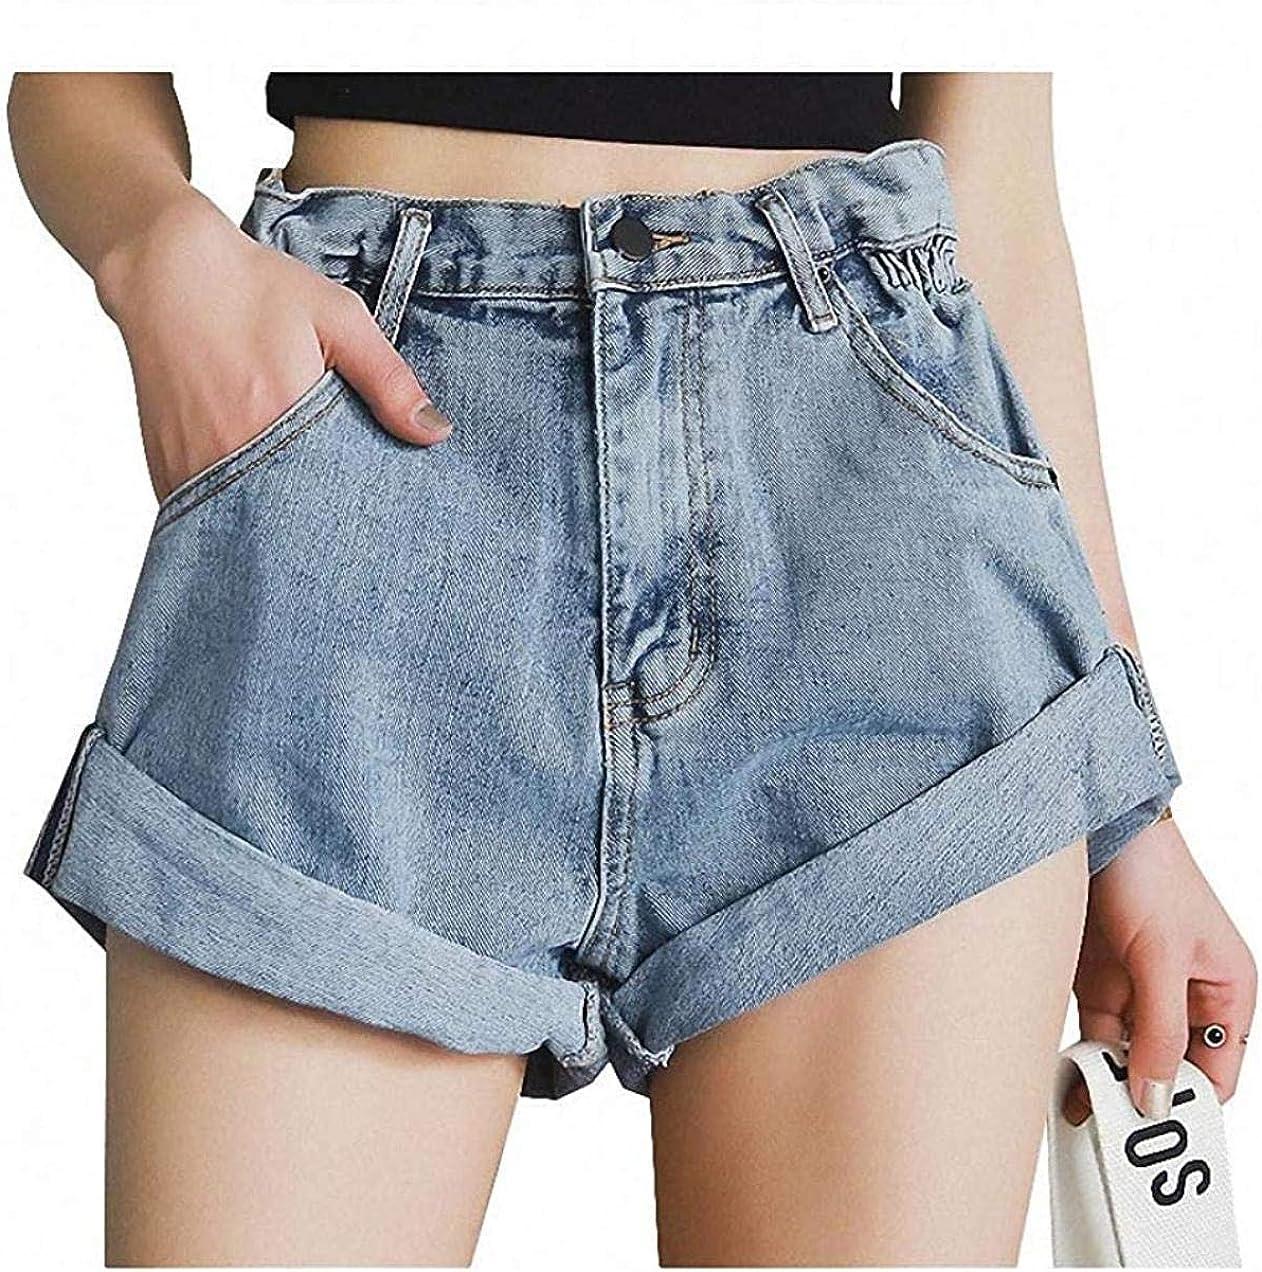 Denim Shorts Women's White Women Short Jeans Khaki Wide Leg Elastic Waist Vintage High Waist Shorts Women Summer